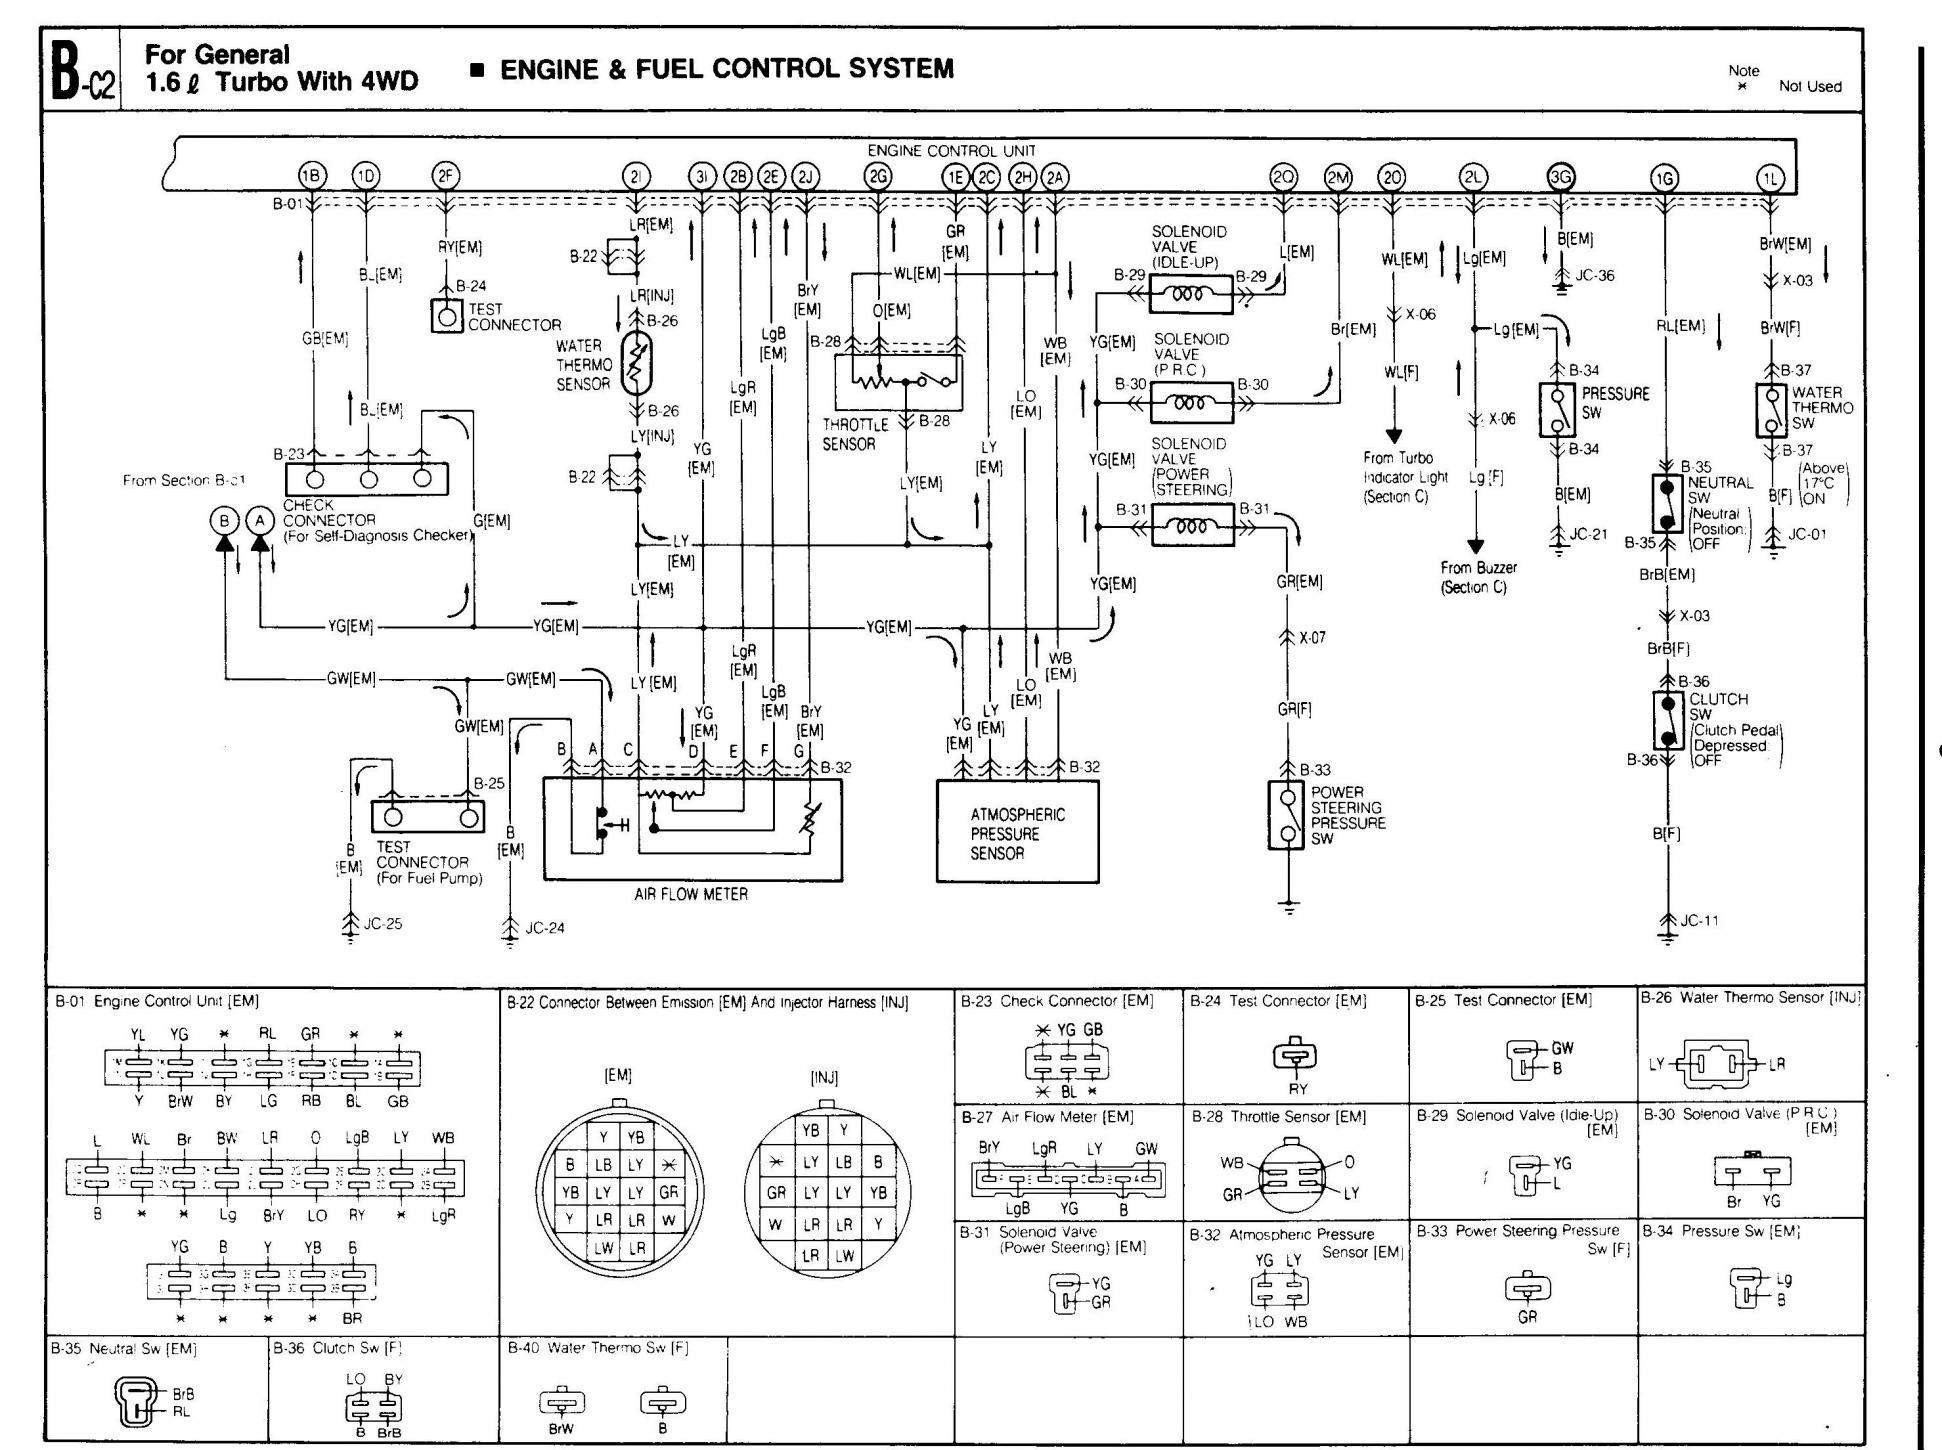 [ZTBE_9966]  Club Protege | 1991 Isuzu Impulse Wiring Diagram |  | Club Protege